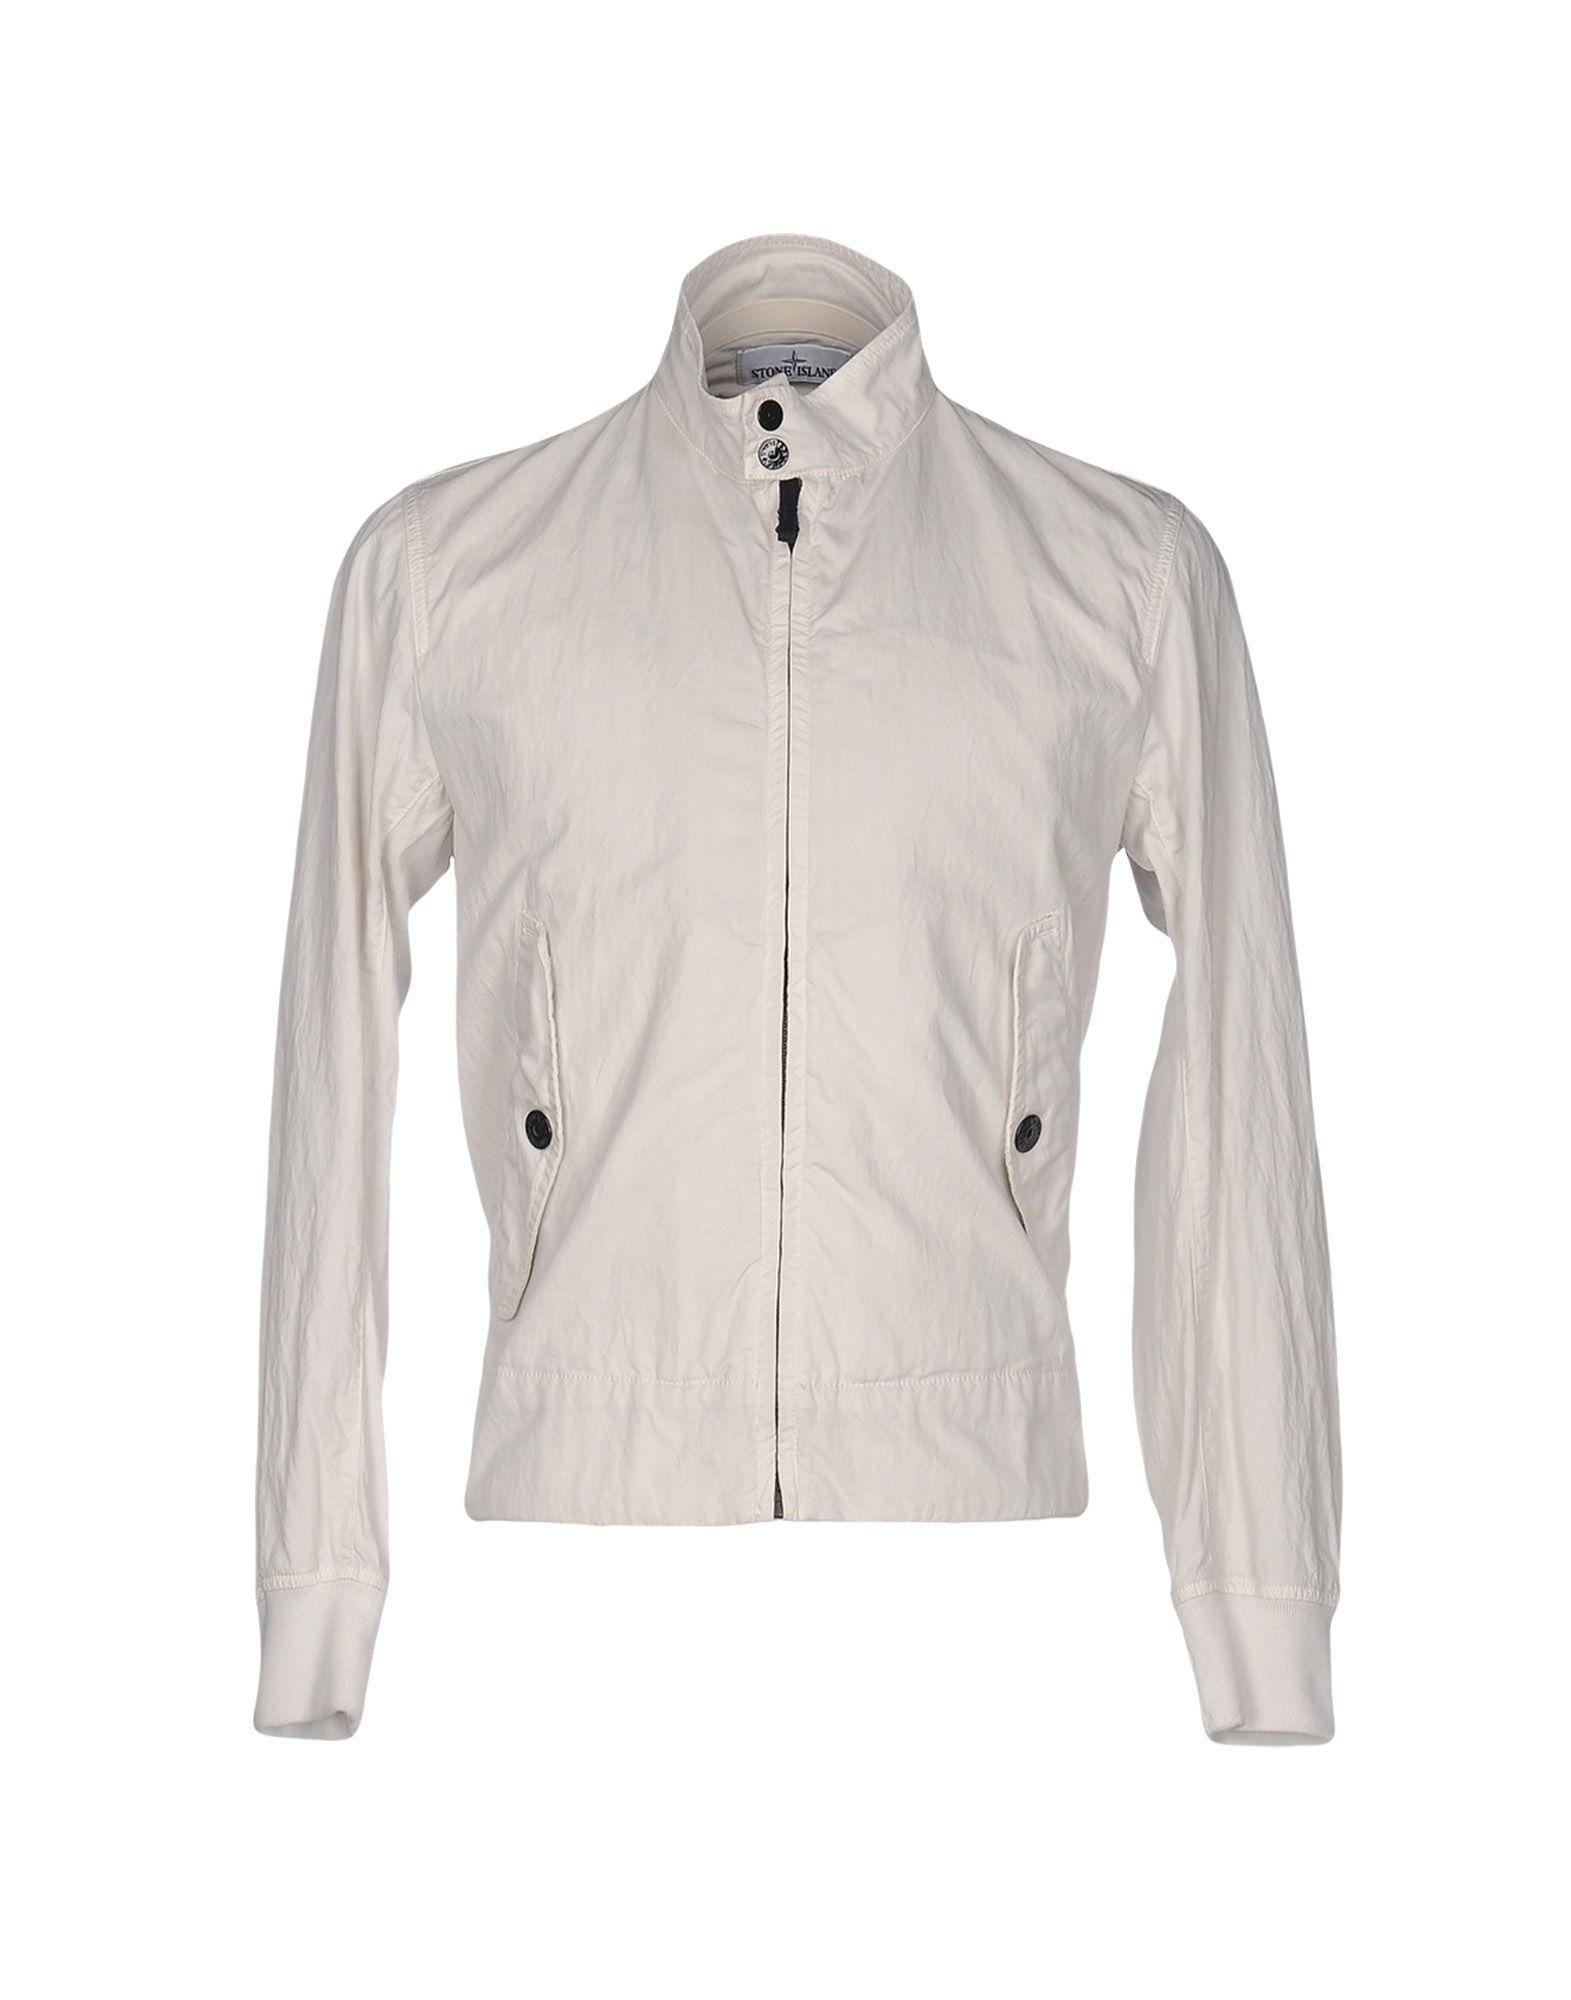 Stone Island Light Grey Cotton Jacket